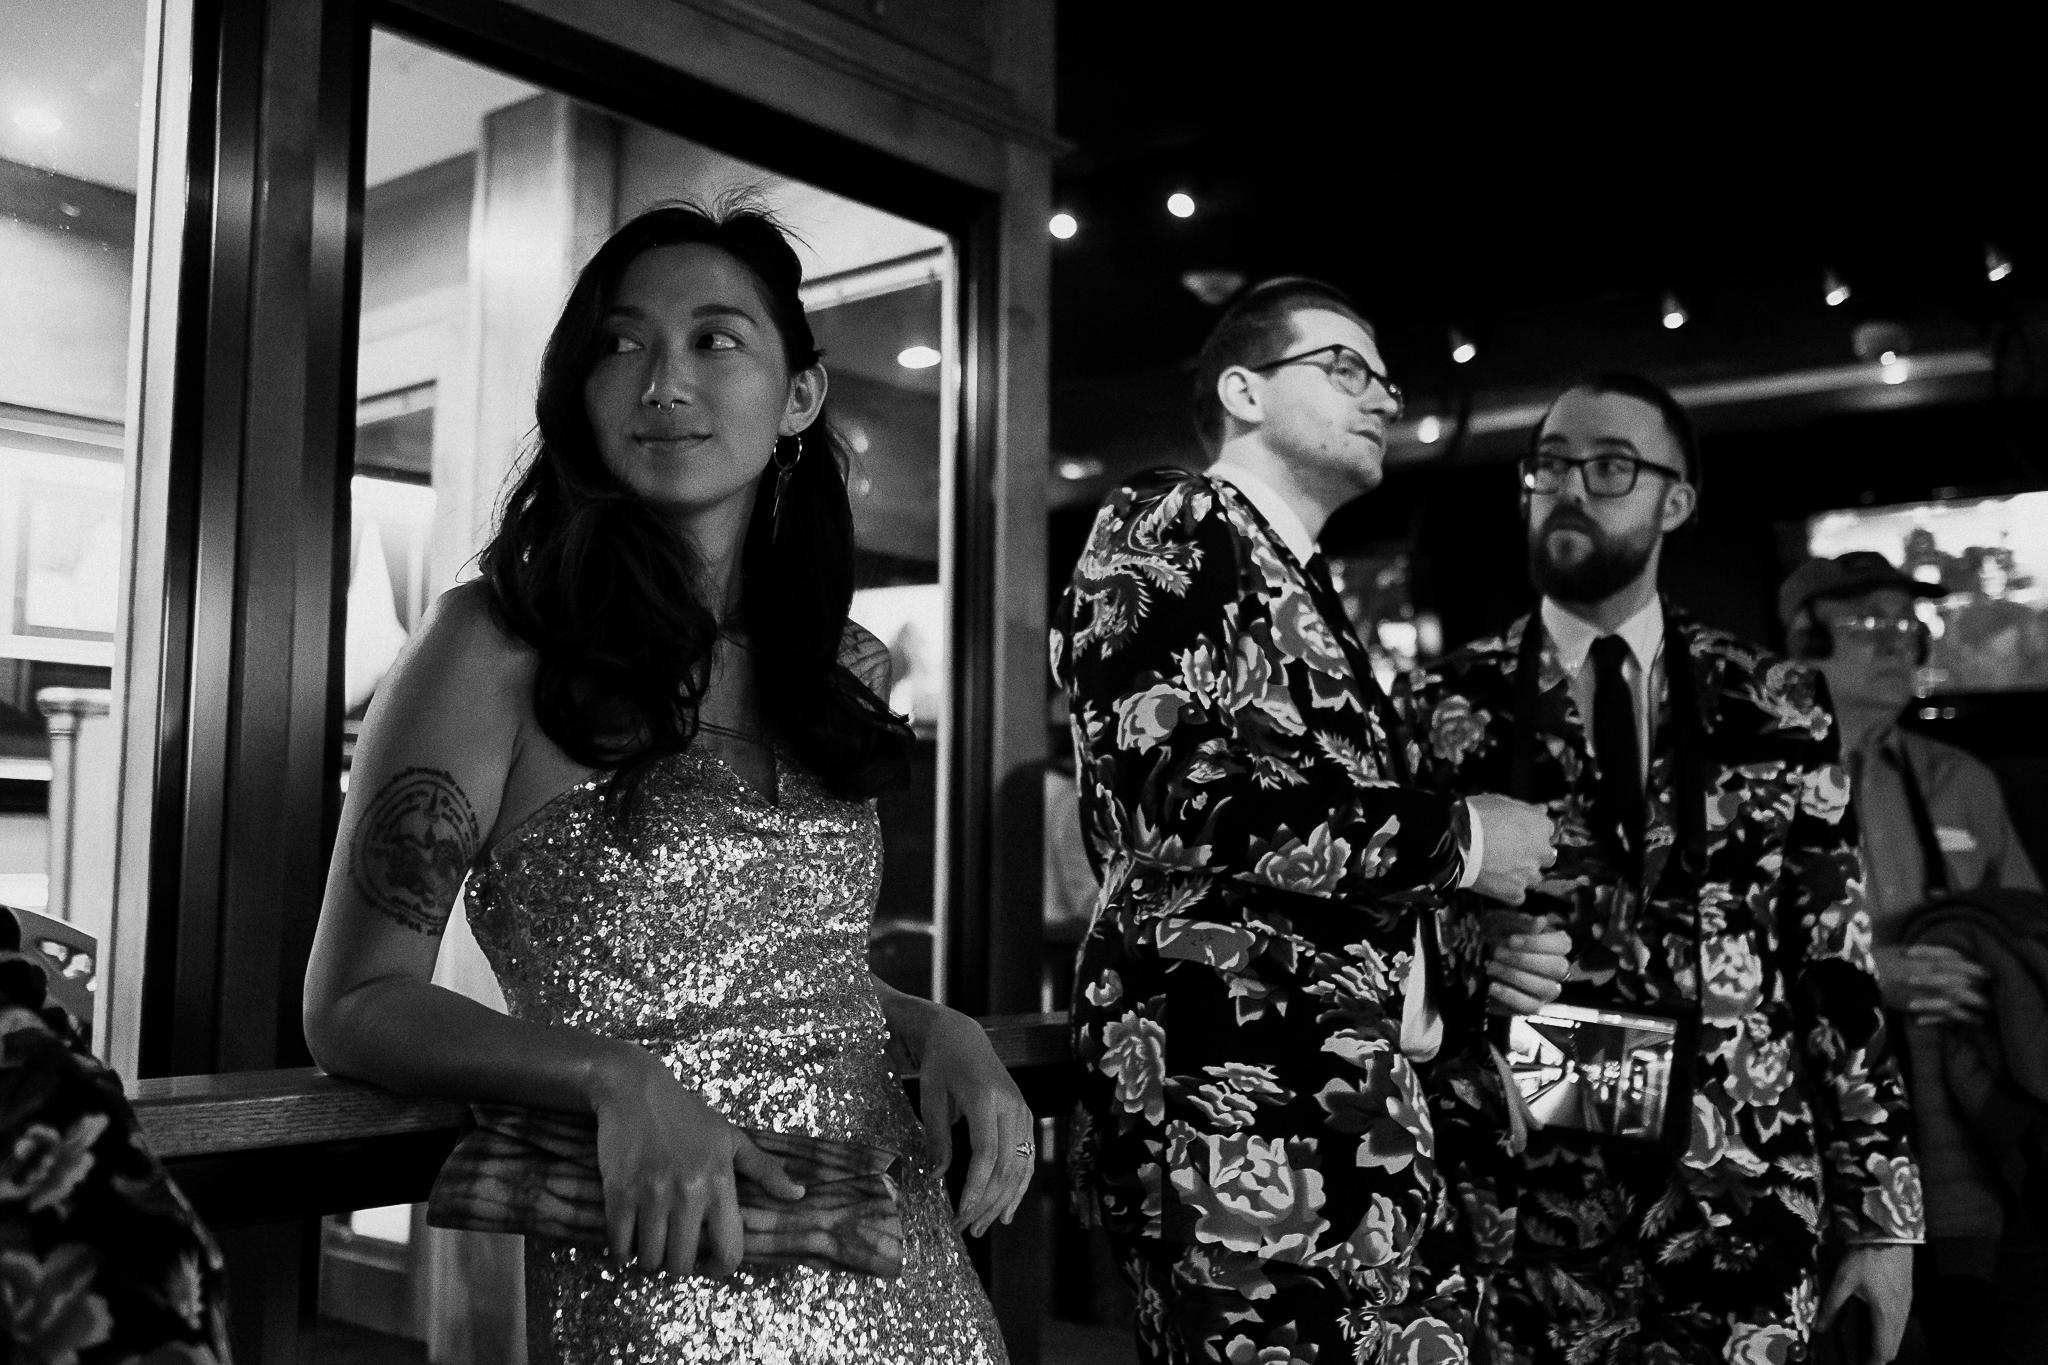 graceland-wedding-memphis-wedding-photographers-beryl-sean-2366-2.jpg